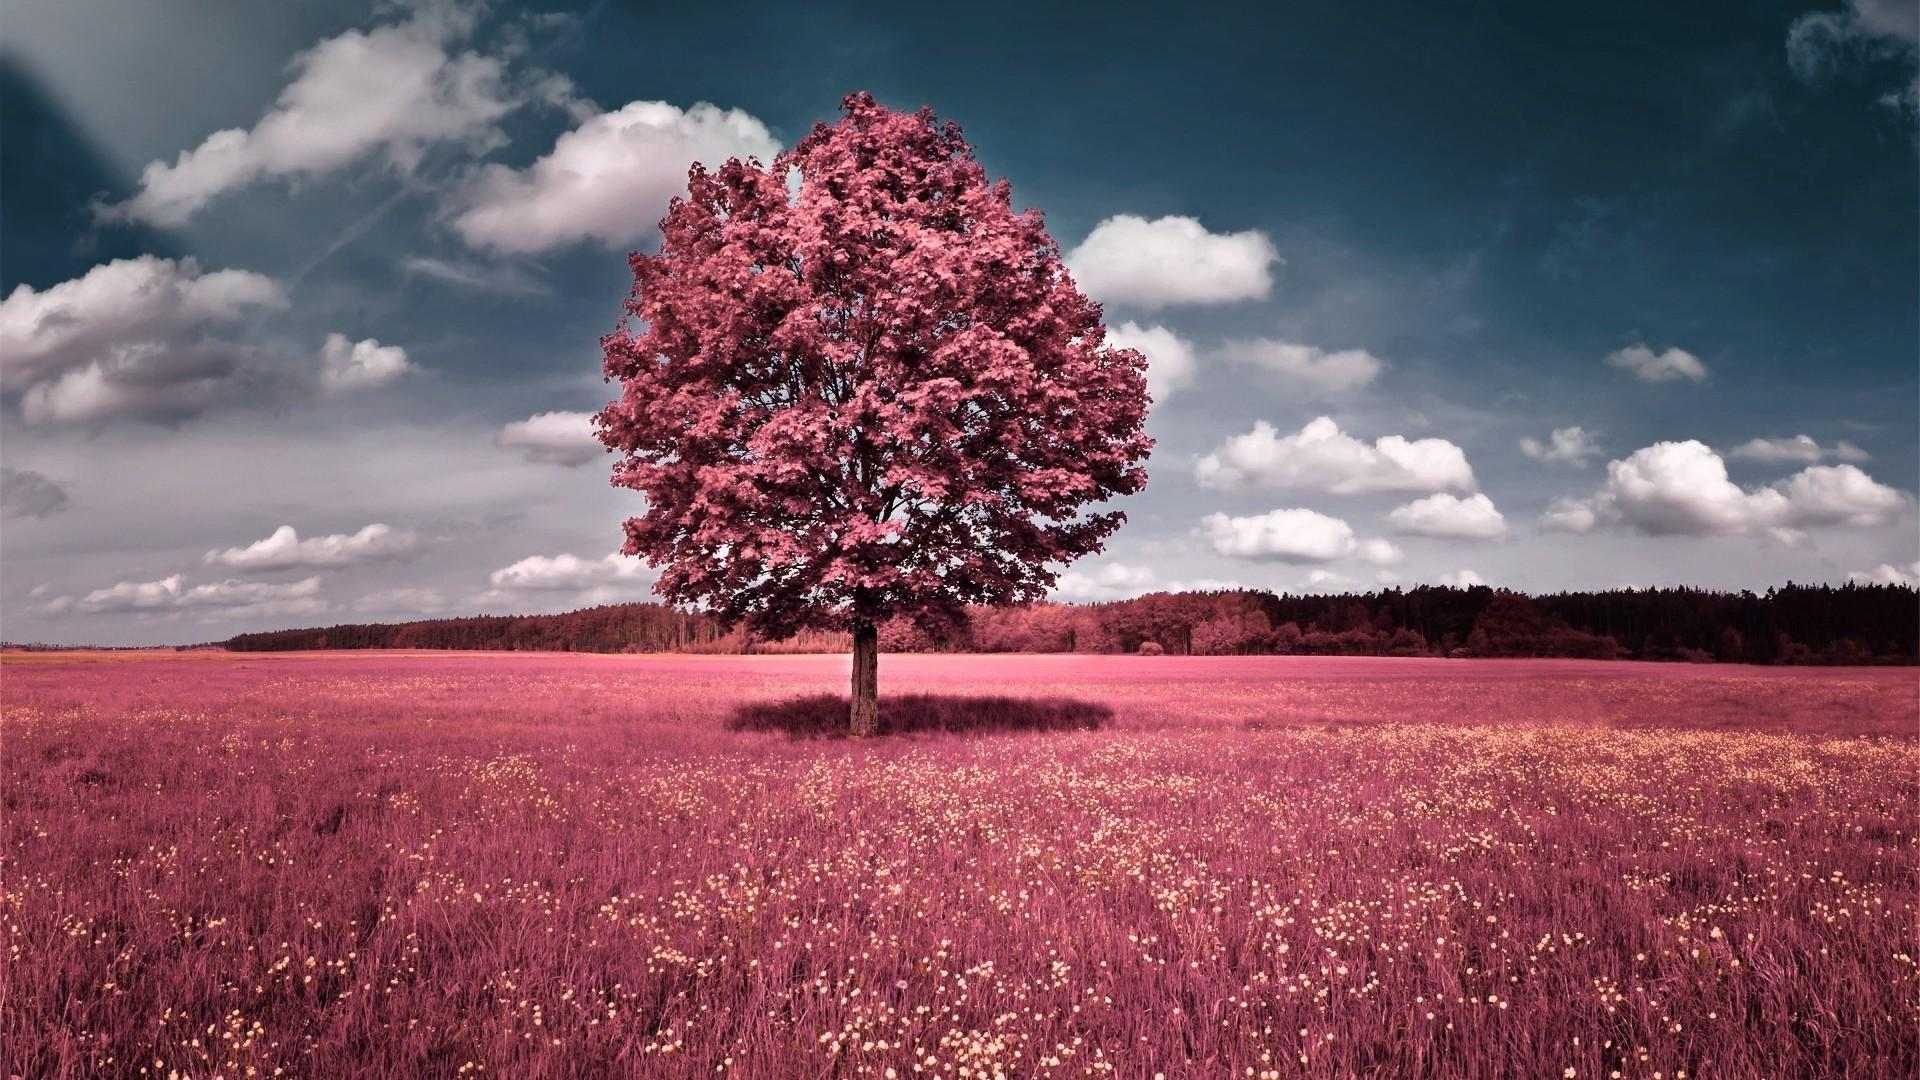 Wallpaper : sunlight, trees, sunset, nature, sky, field, clouds ...